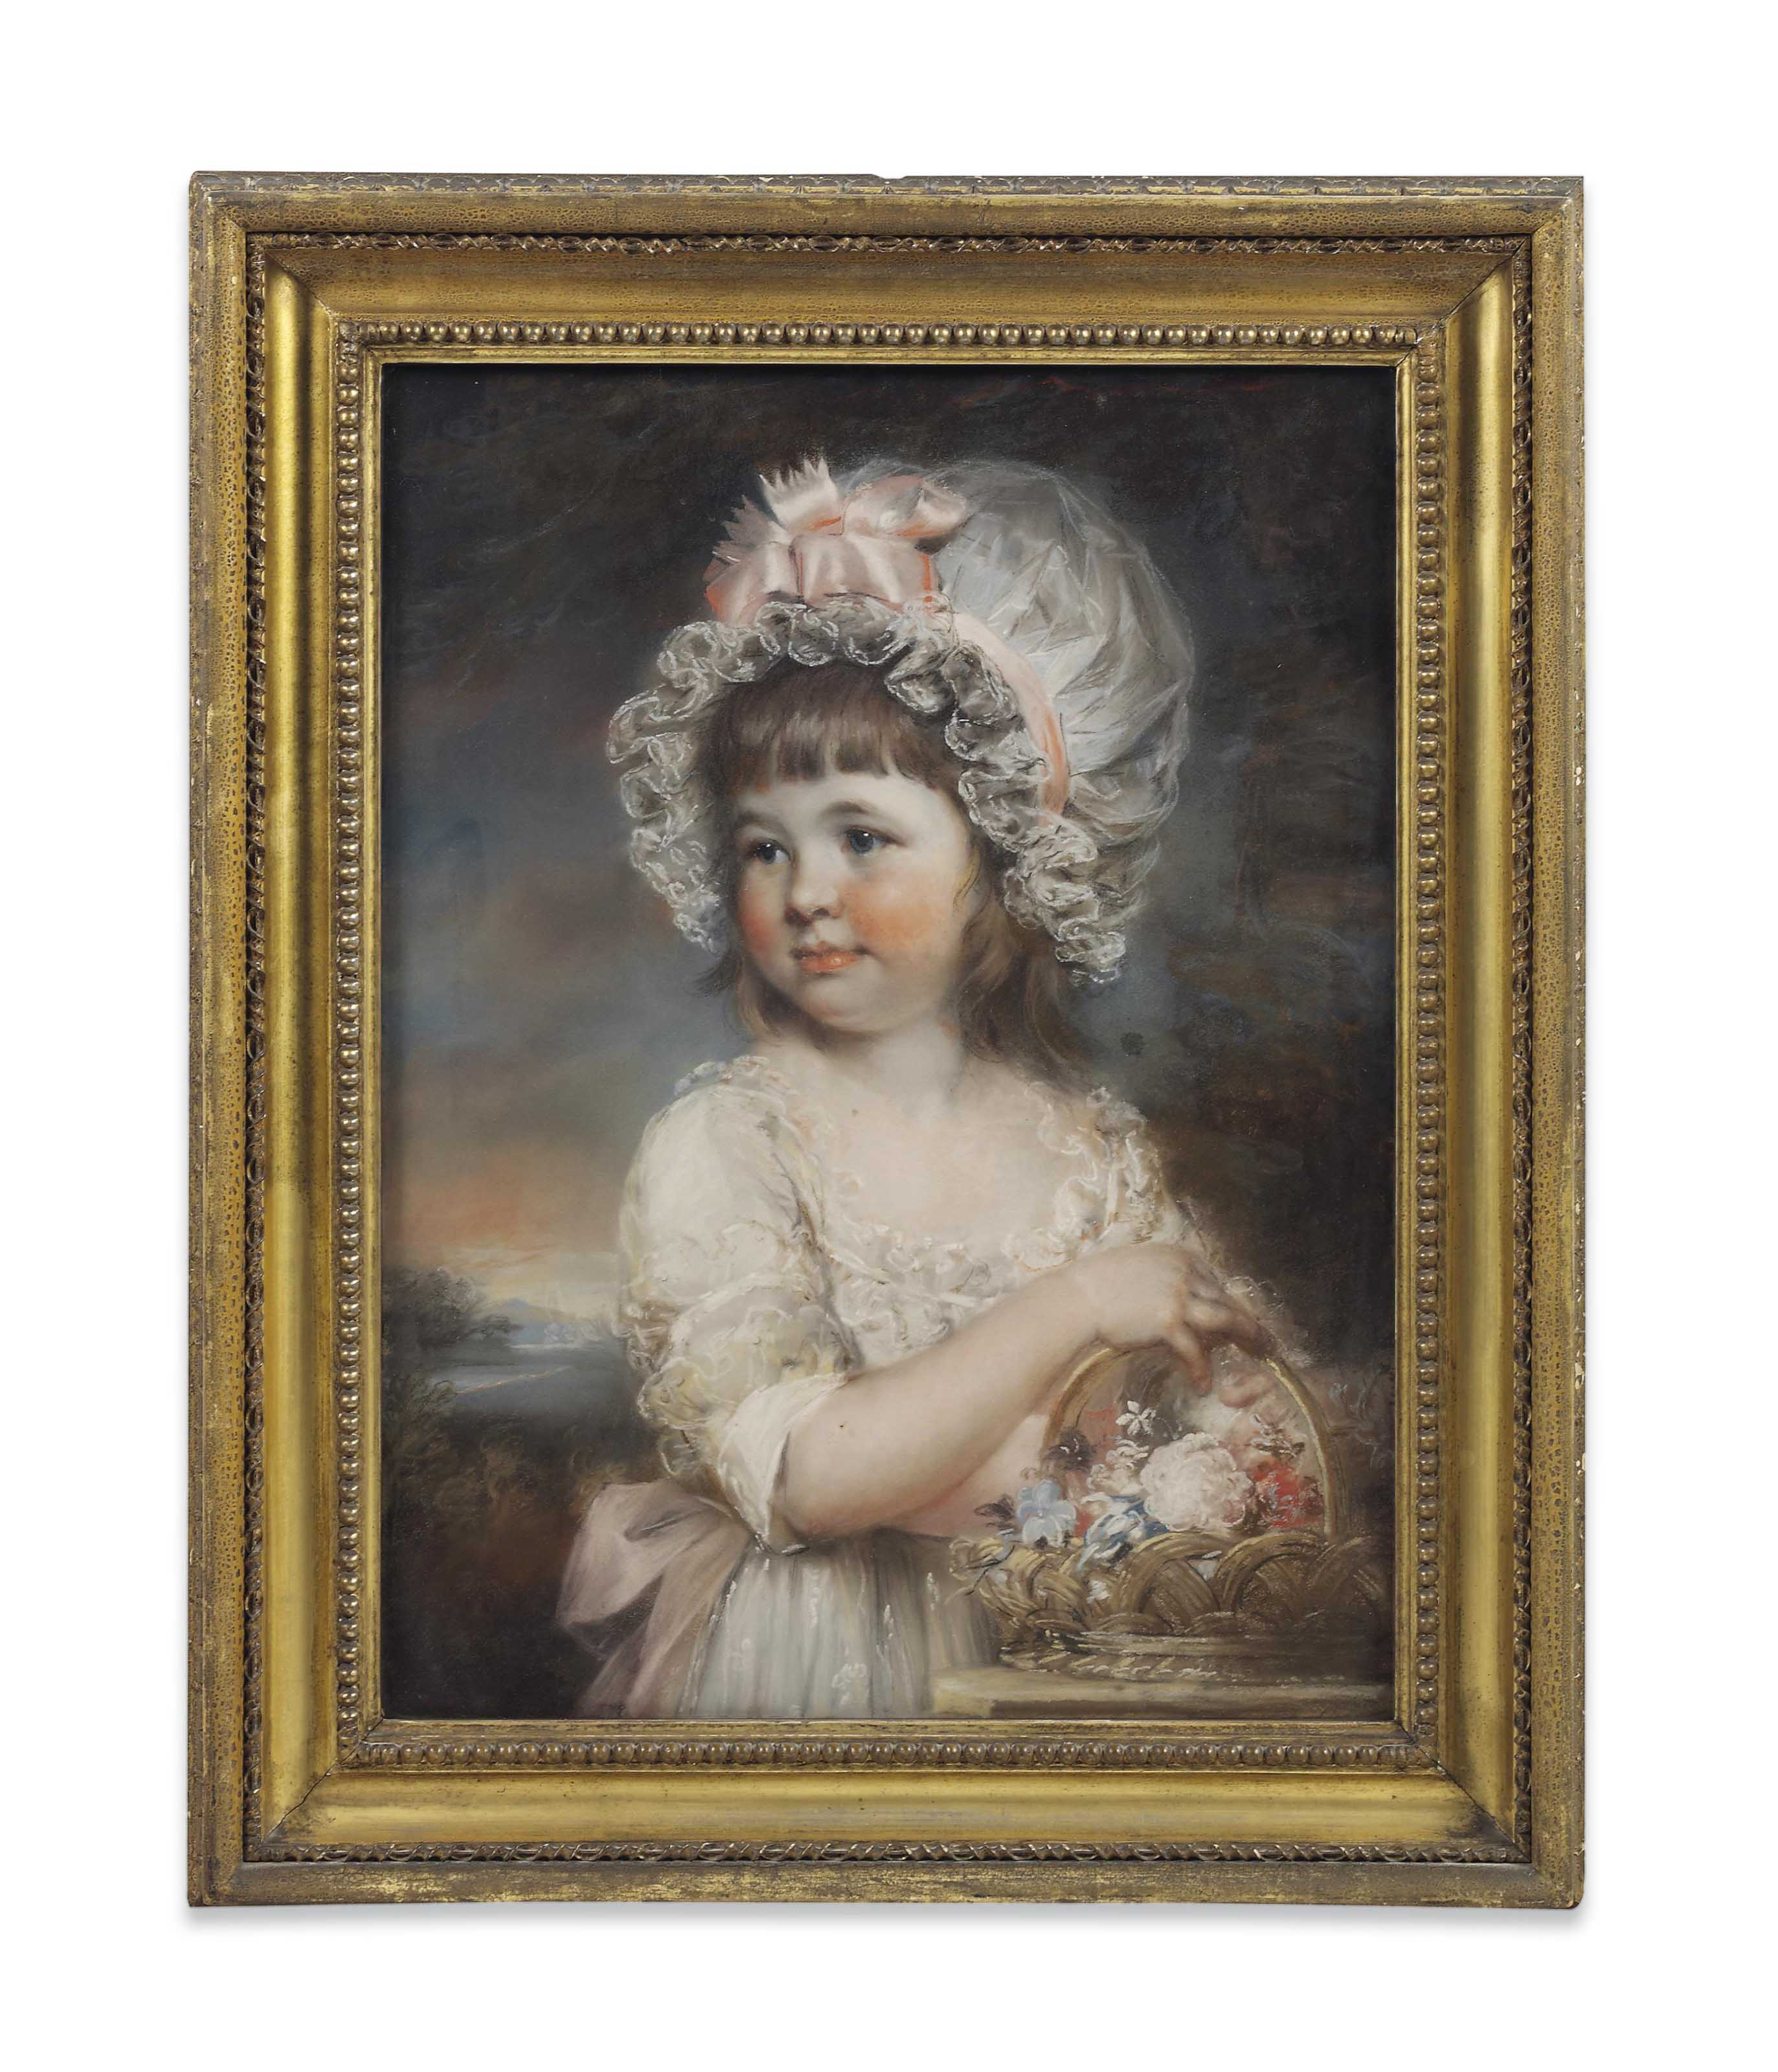 Portrait of Lady Henrietta Elizabeth Cavendish, younger daughter of William, fifth Duke of Devonshire, aged five